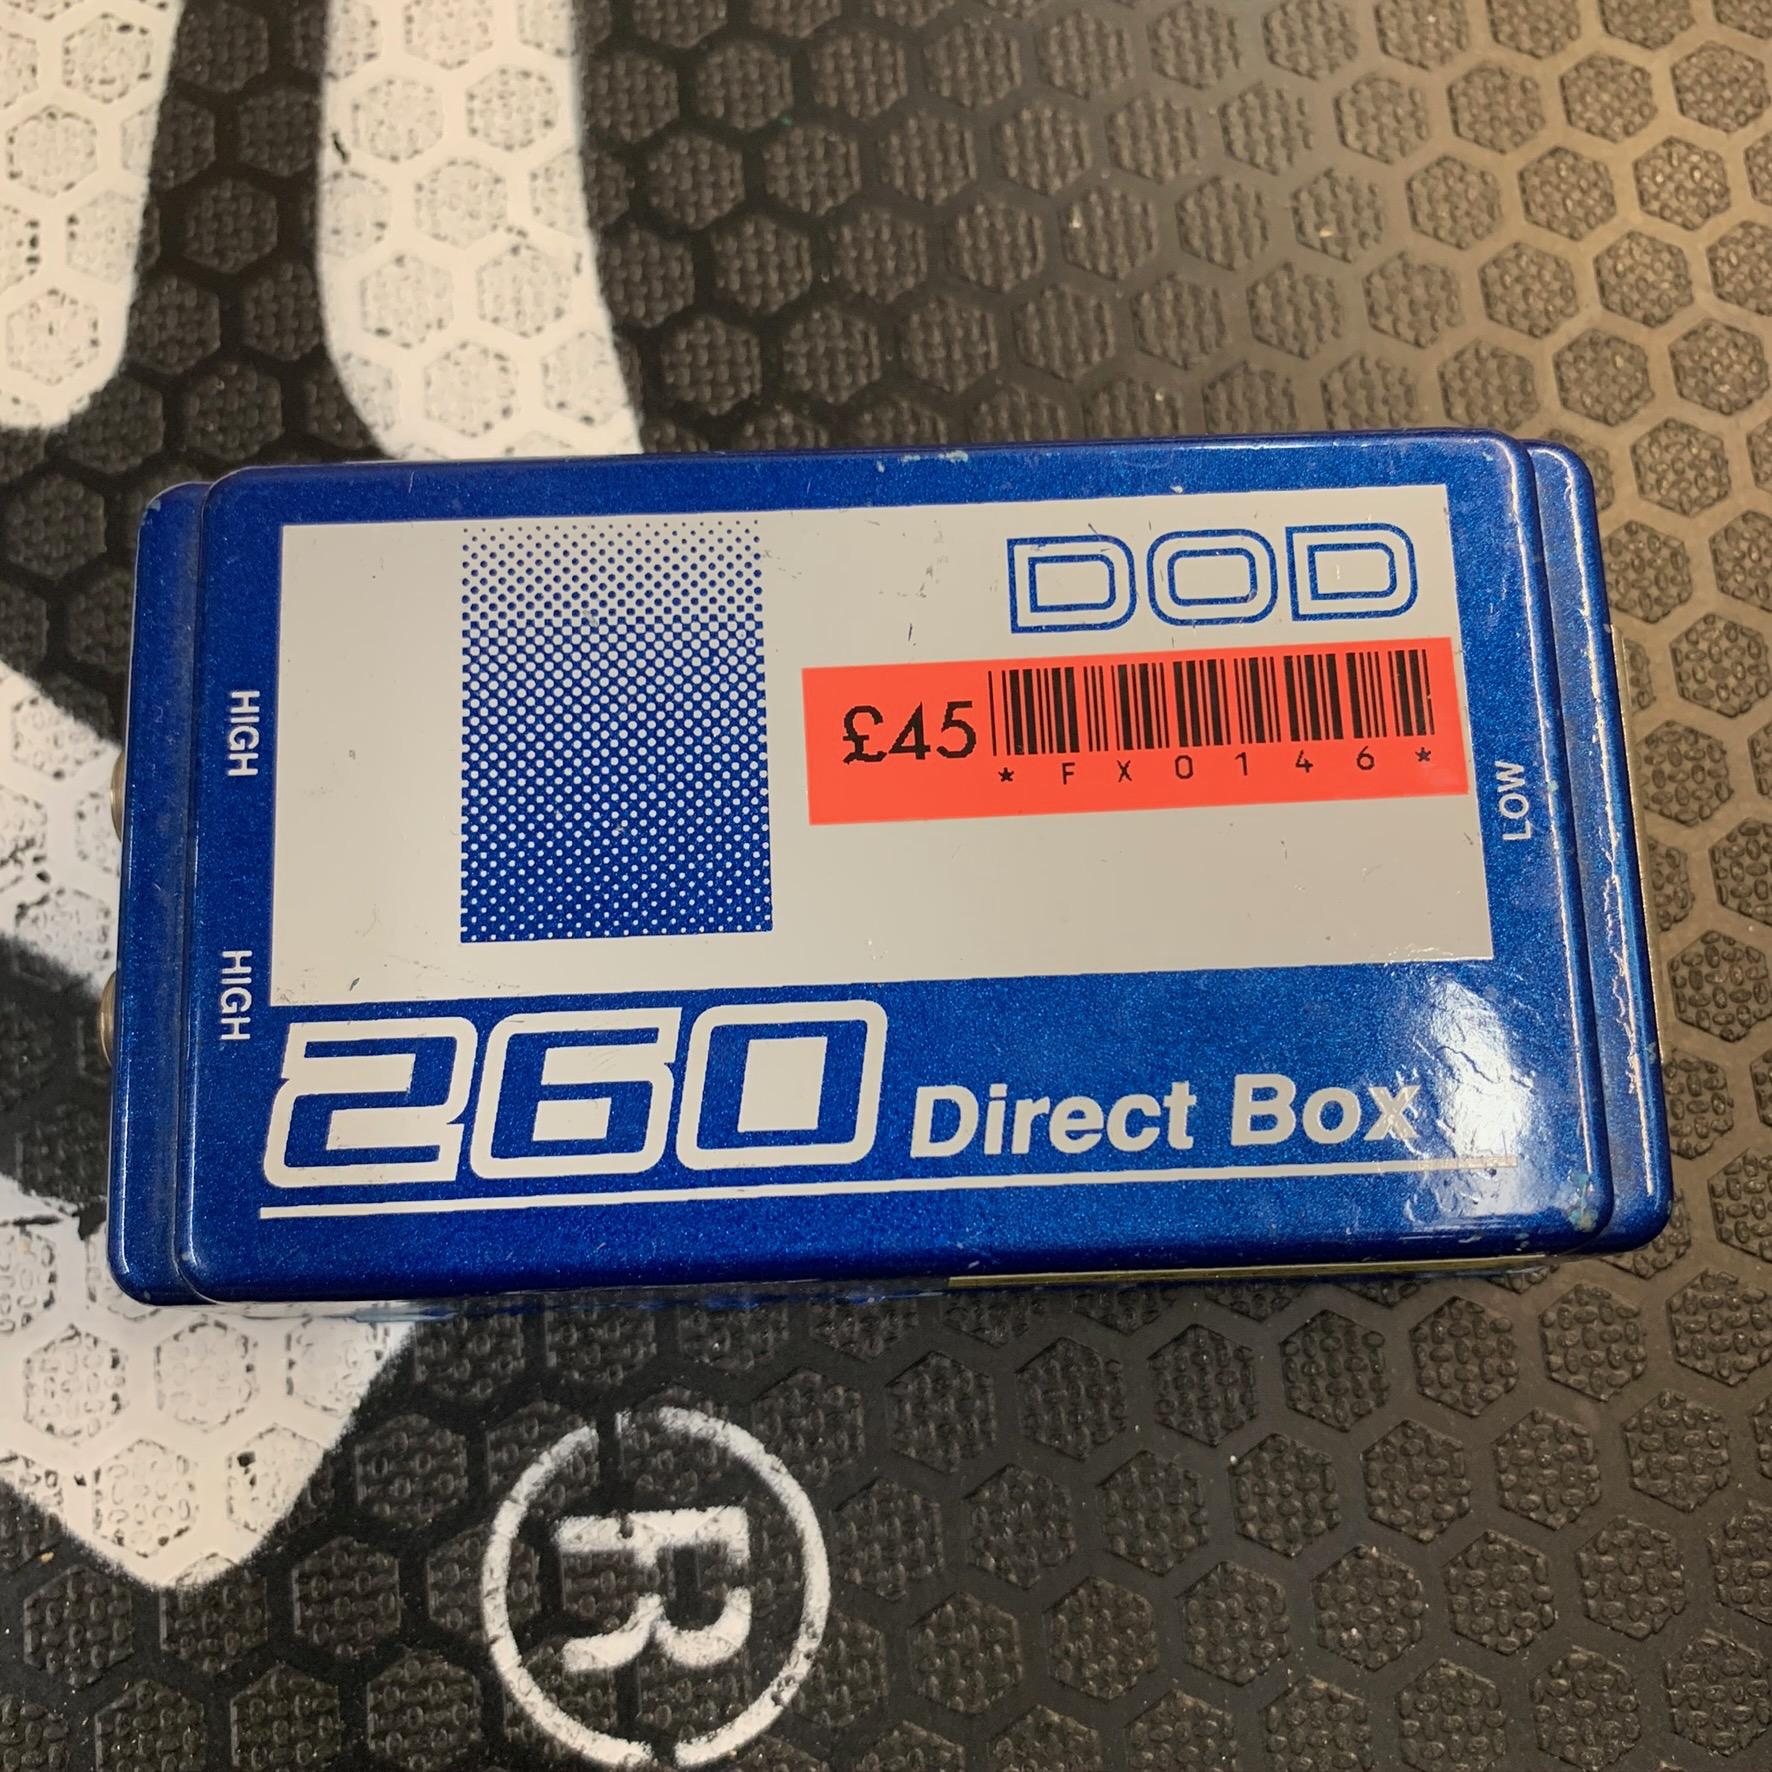 DOD DI BOX 260